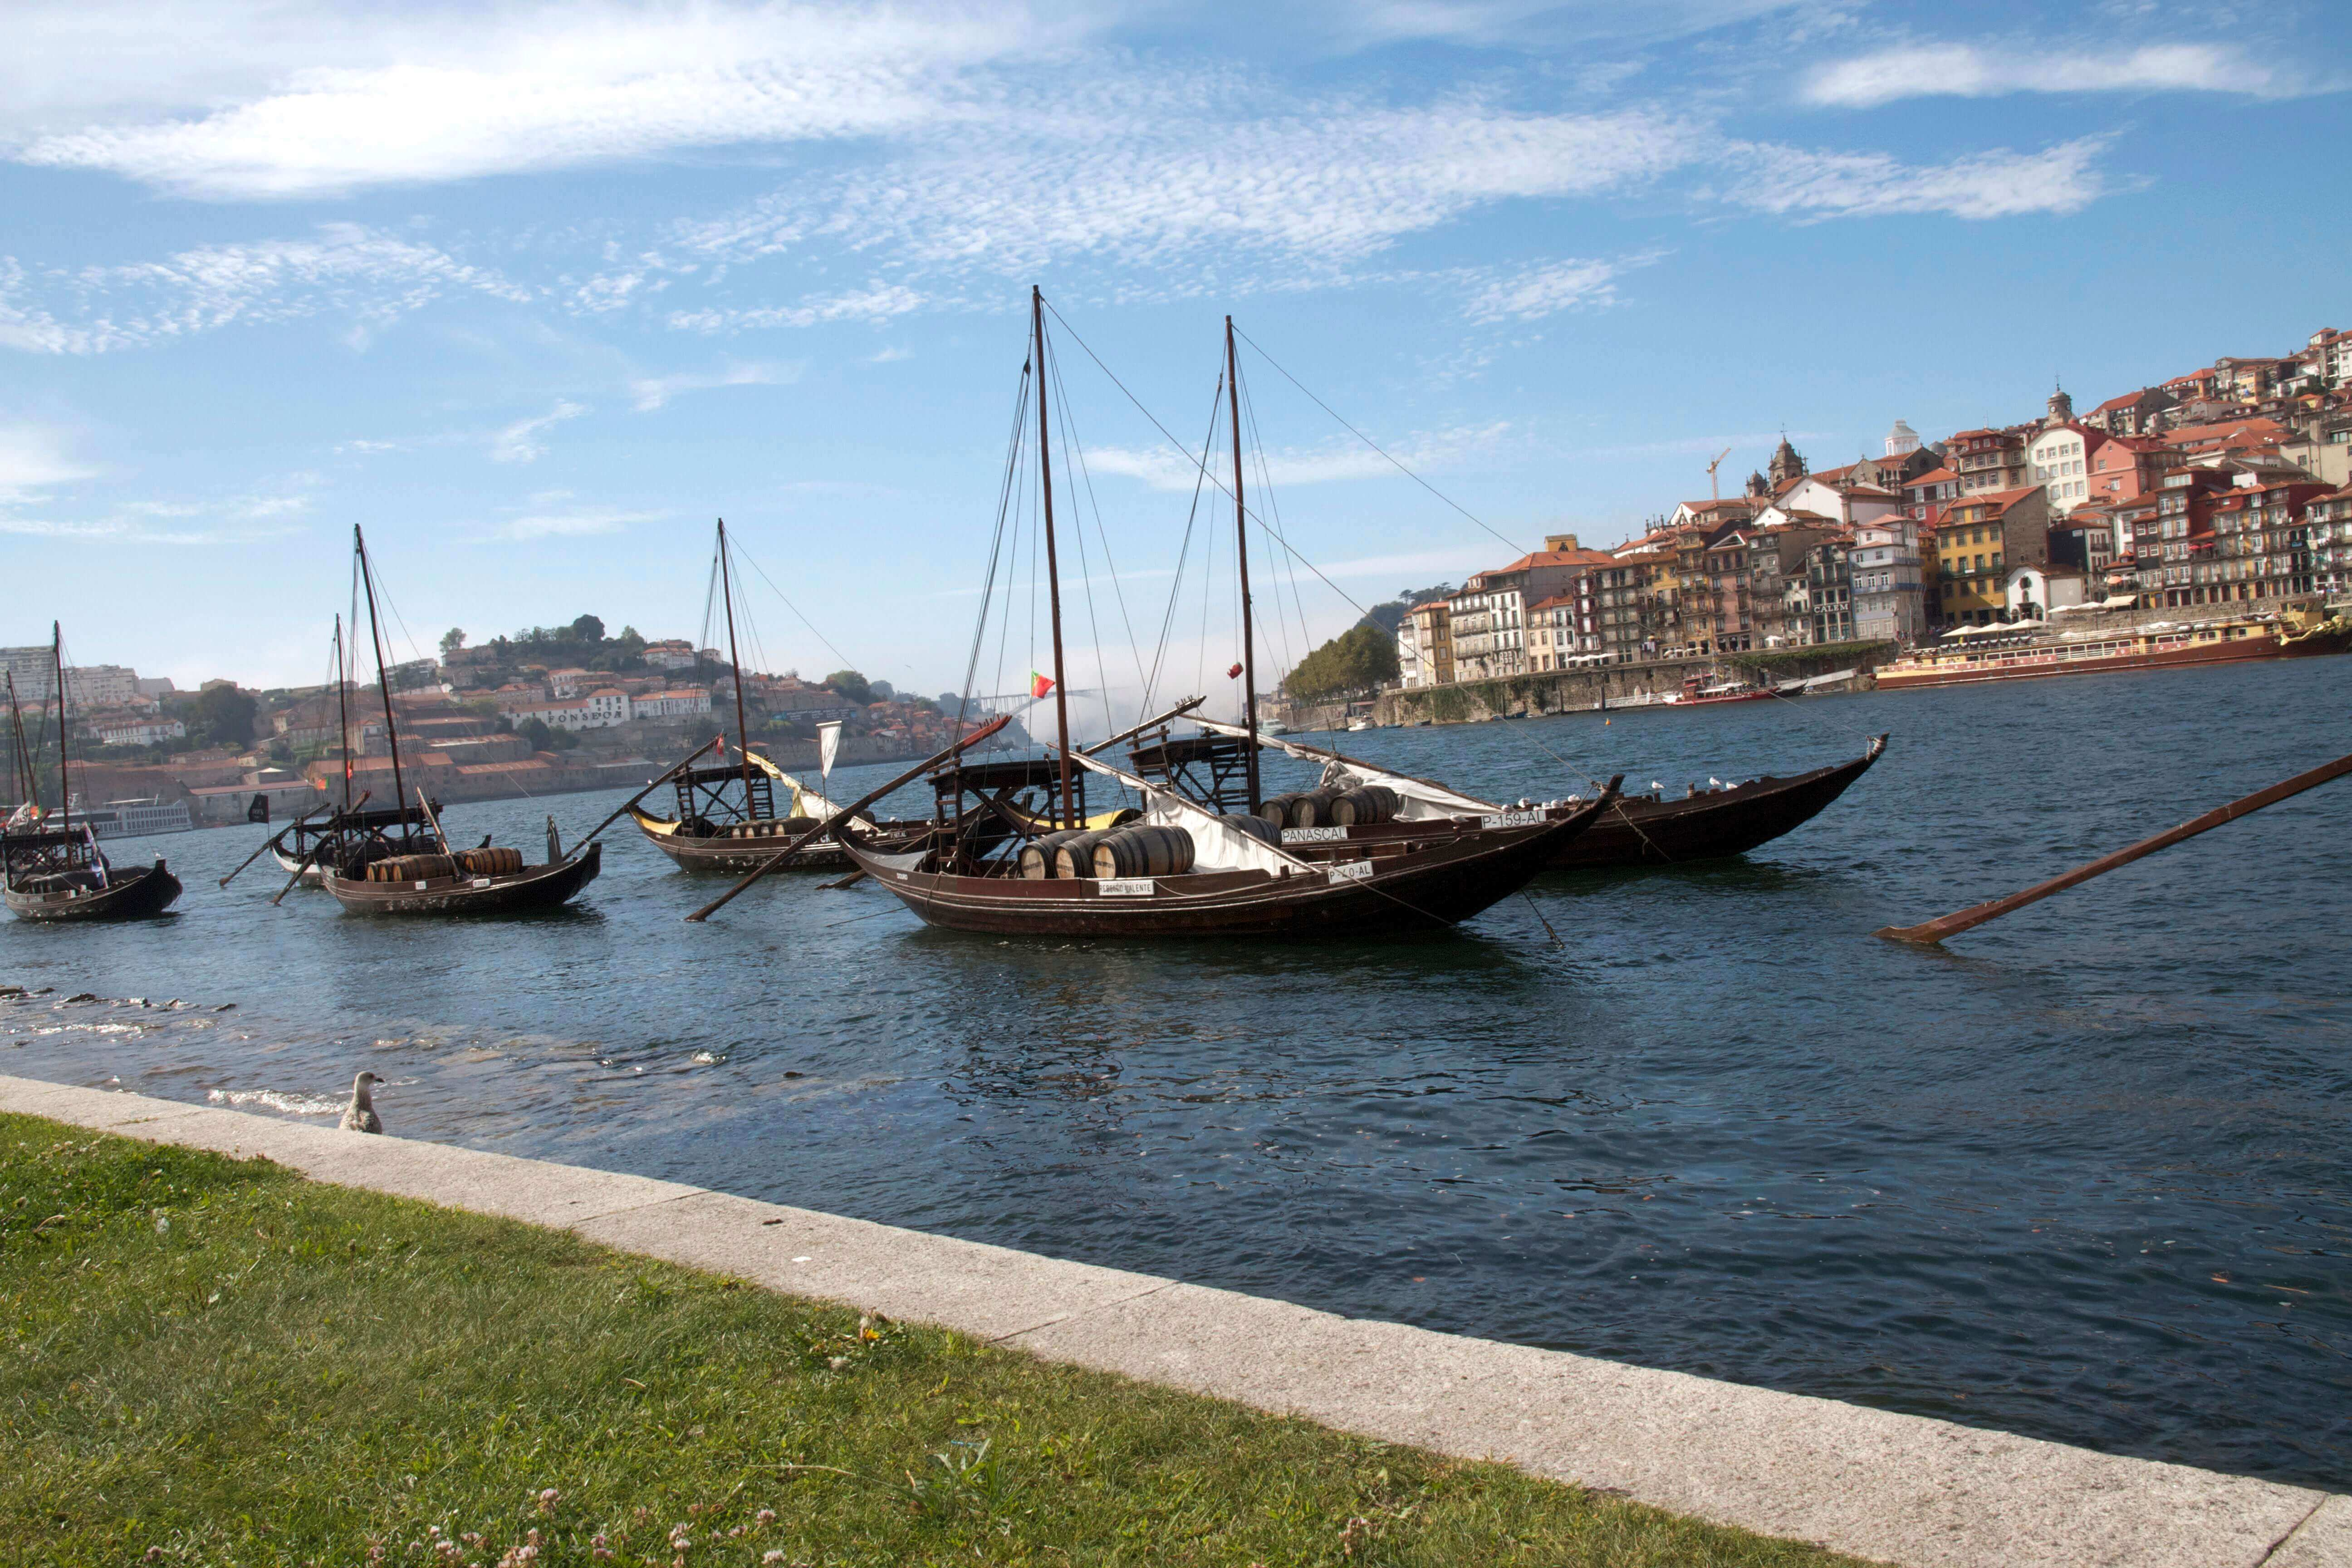 Portwine Day in Porto und Vila Nova de Gaia entlang der Ribeira